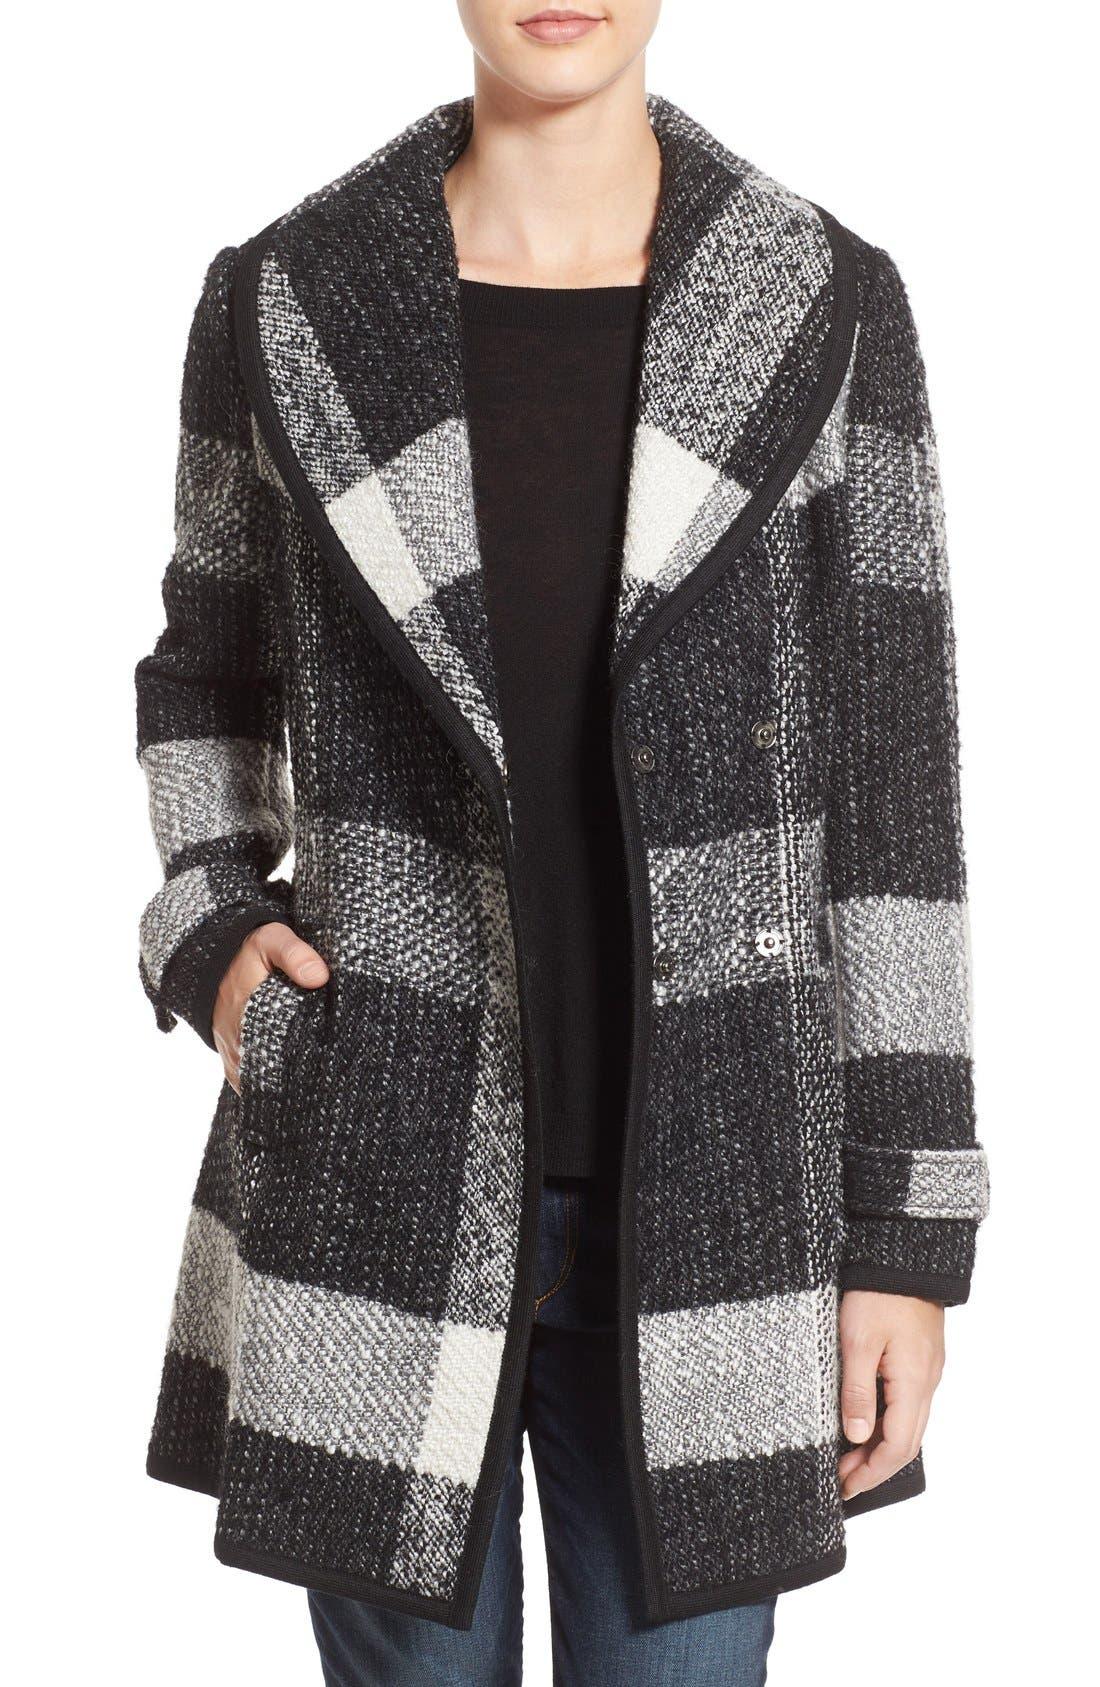 Alternate Image 1 Selected - GUESS Shawl Collar Plaid Coat